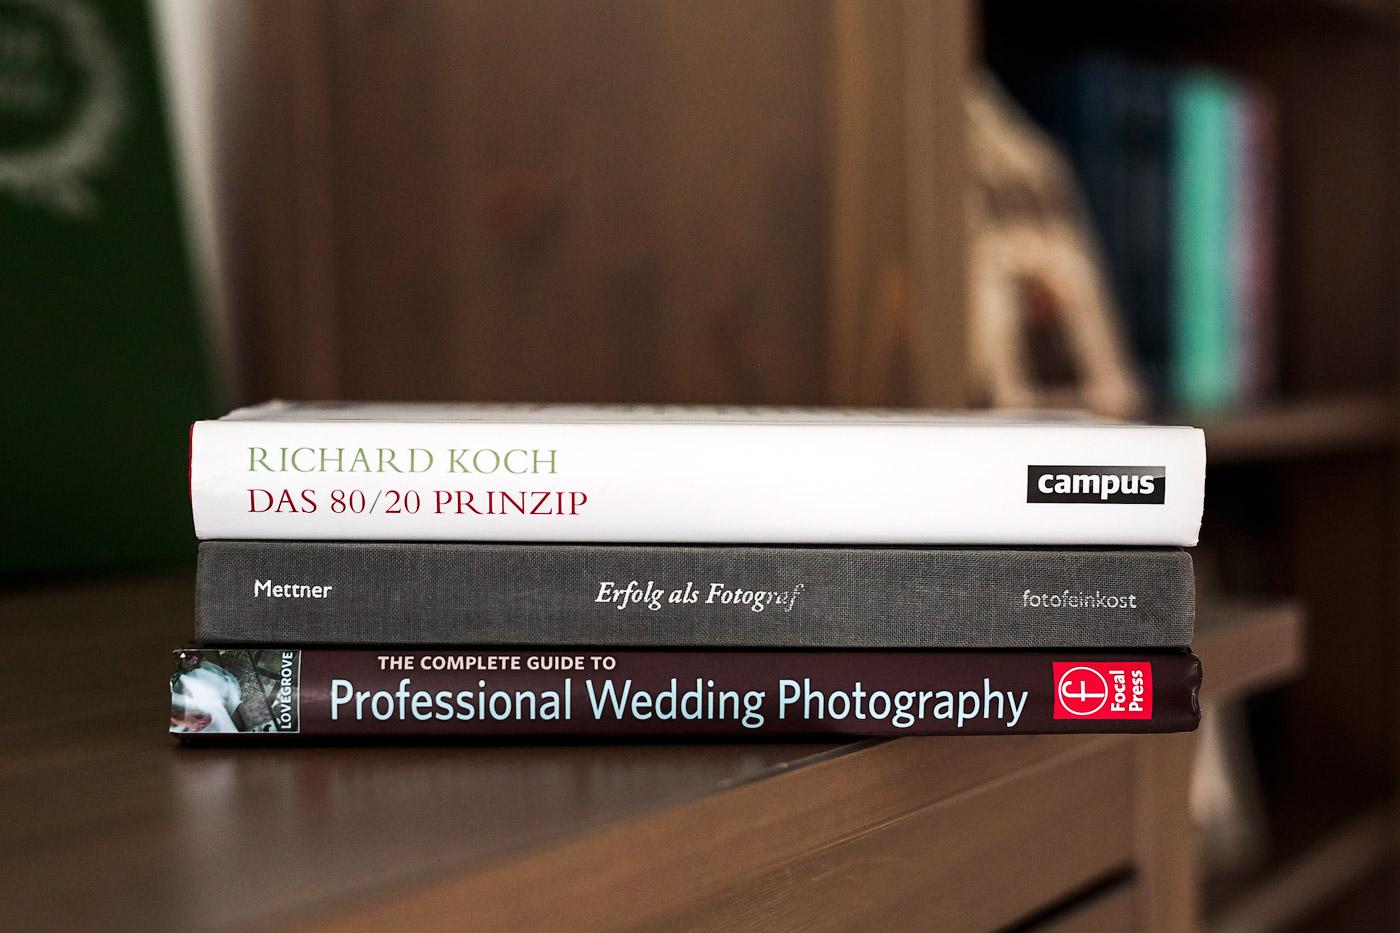 christina_eduard_photography__tipps_hochzeitsfotografie_